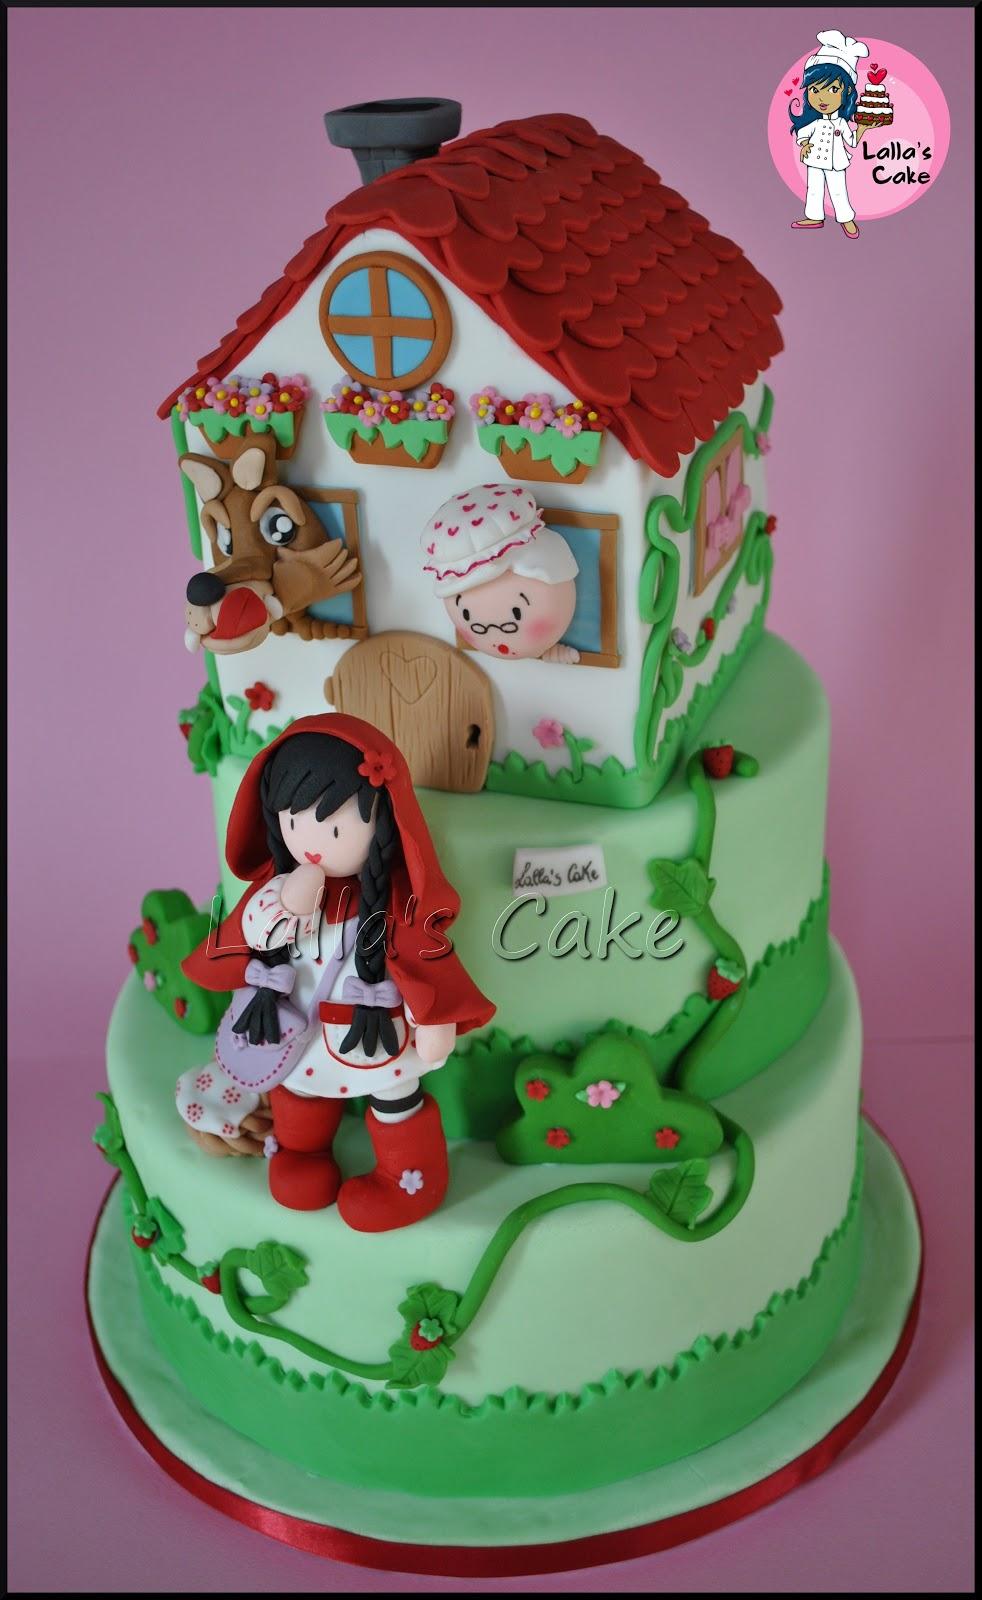 Rivista Cake Design Renato : Vincitore categoria